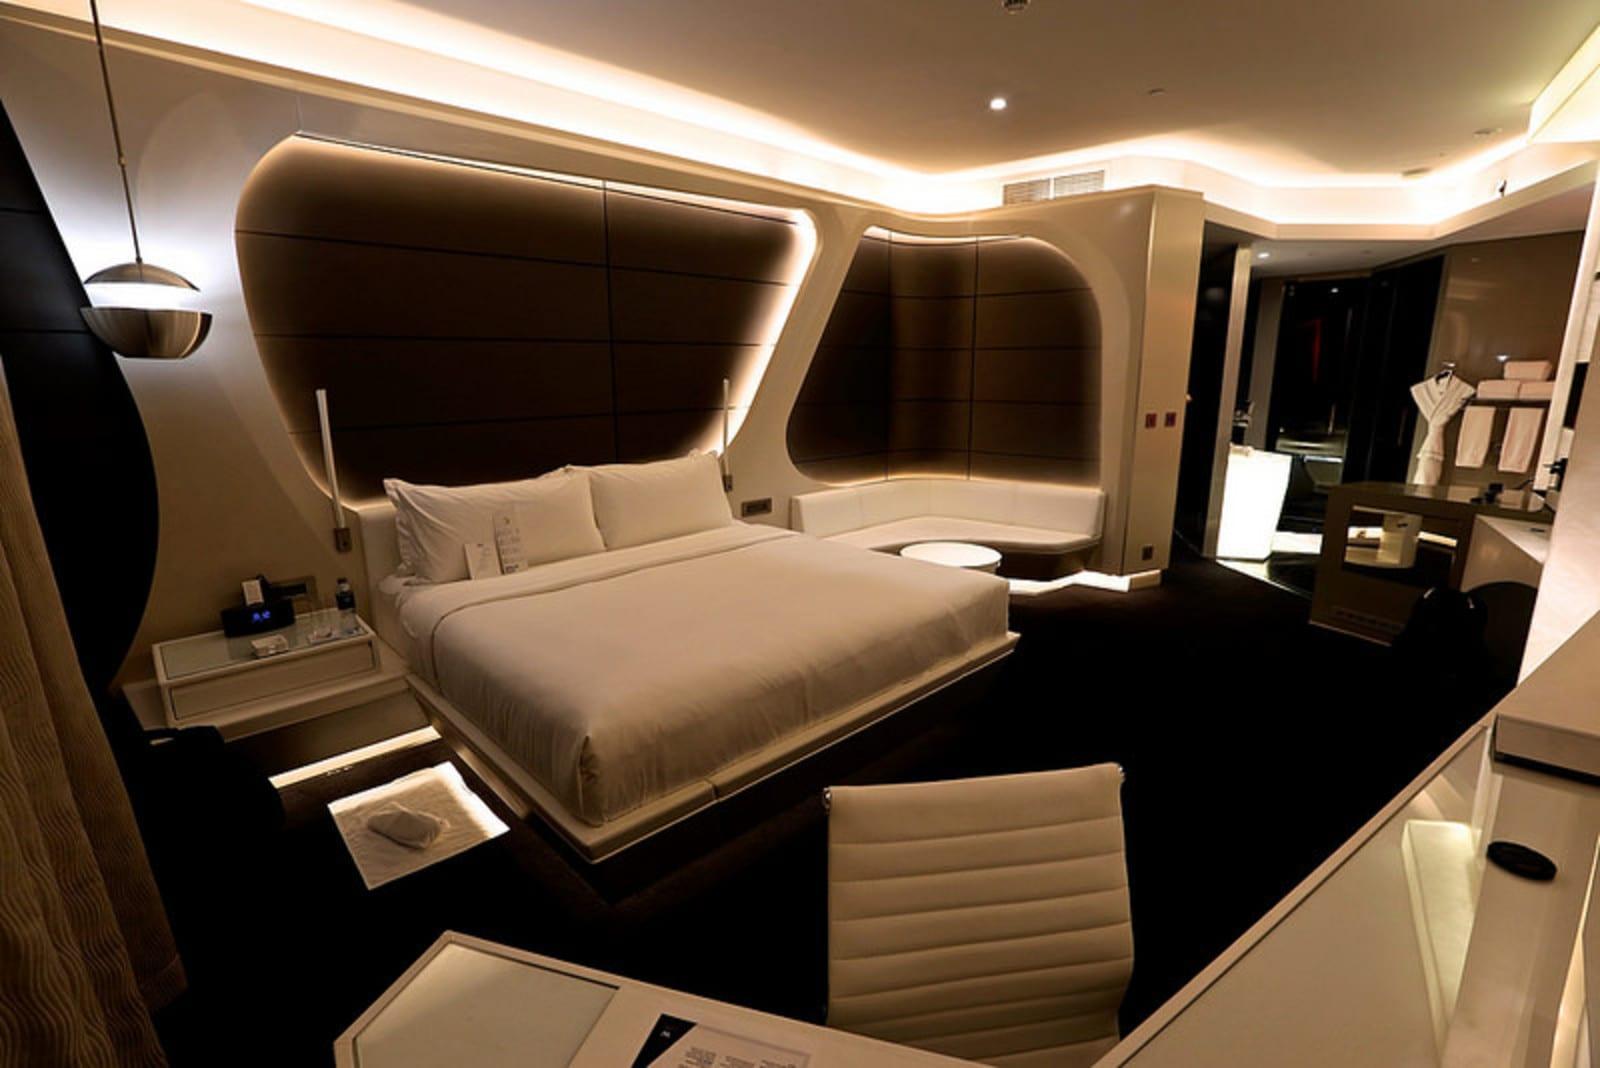 The spacious room at the W Dubai hotel